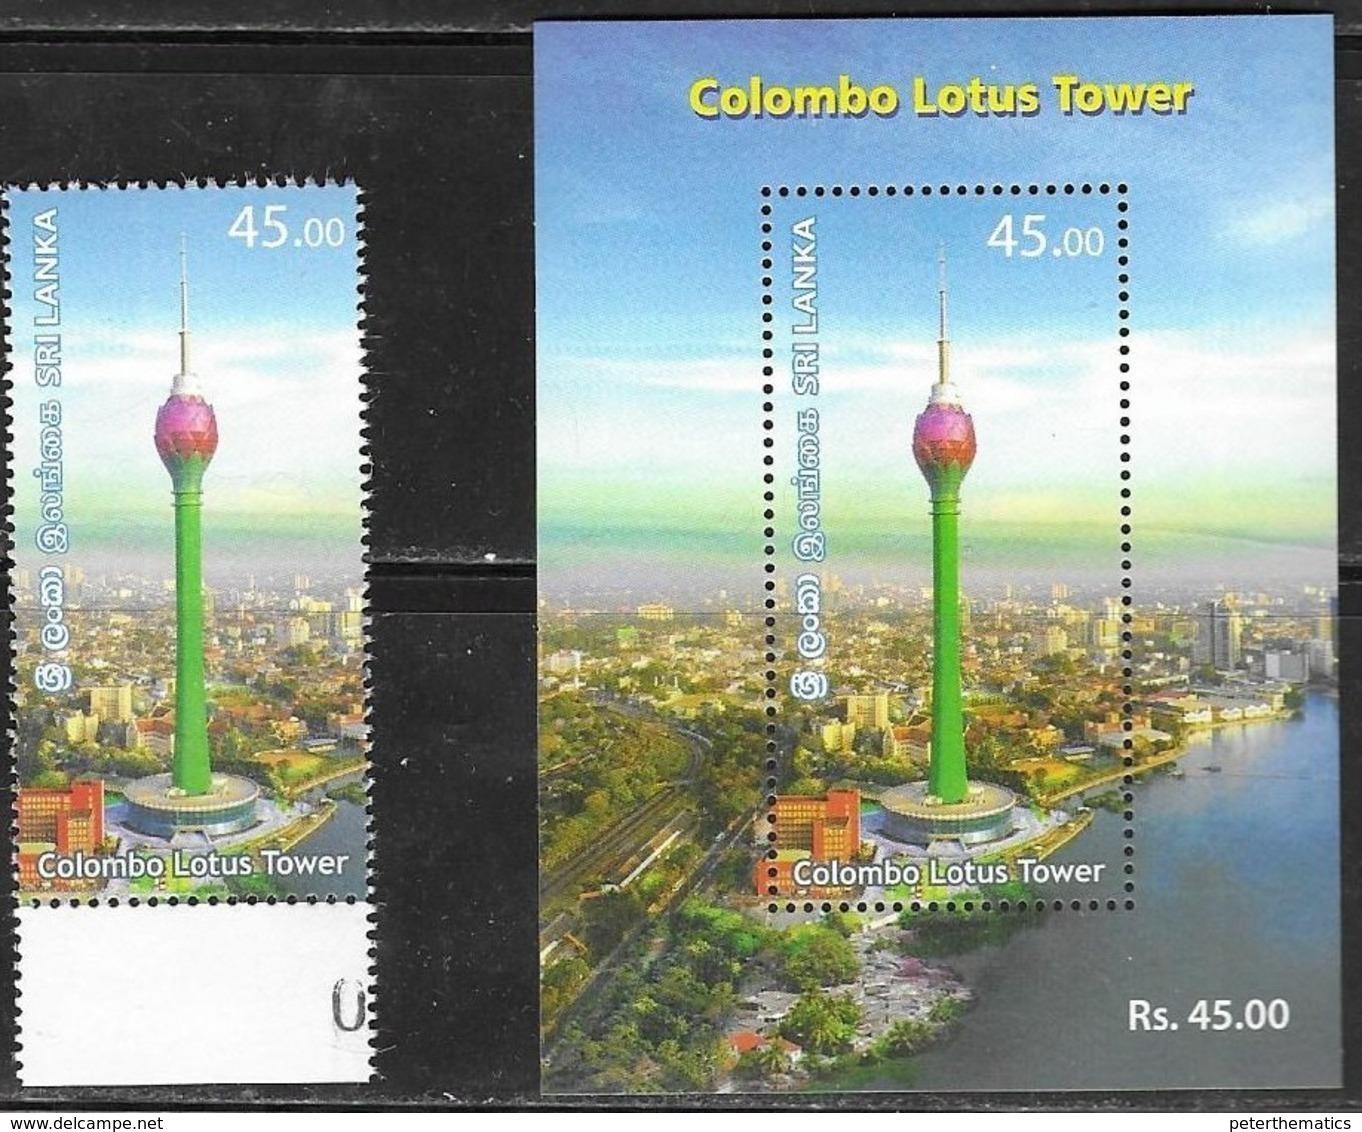 SRI LANKA, 2019, MNH,  TOWERS, COLOMBO LOTUS TOWER, CITY PANORAMIC VIEW, 1v+ S/SHEET - Architectuur